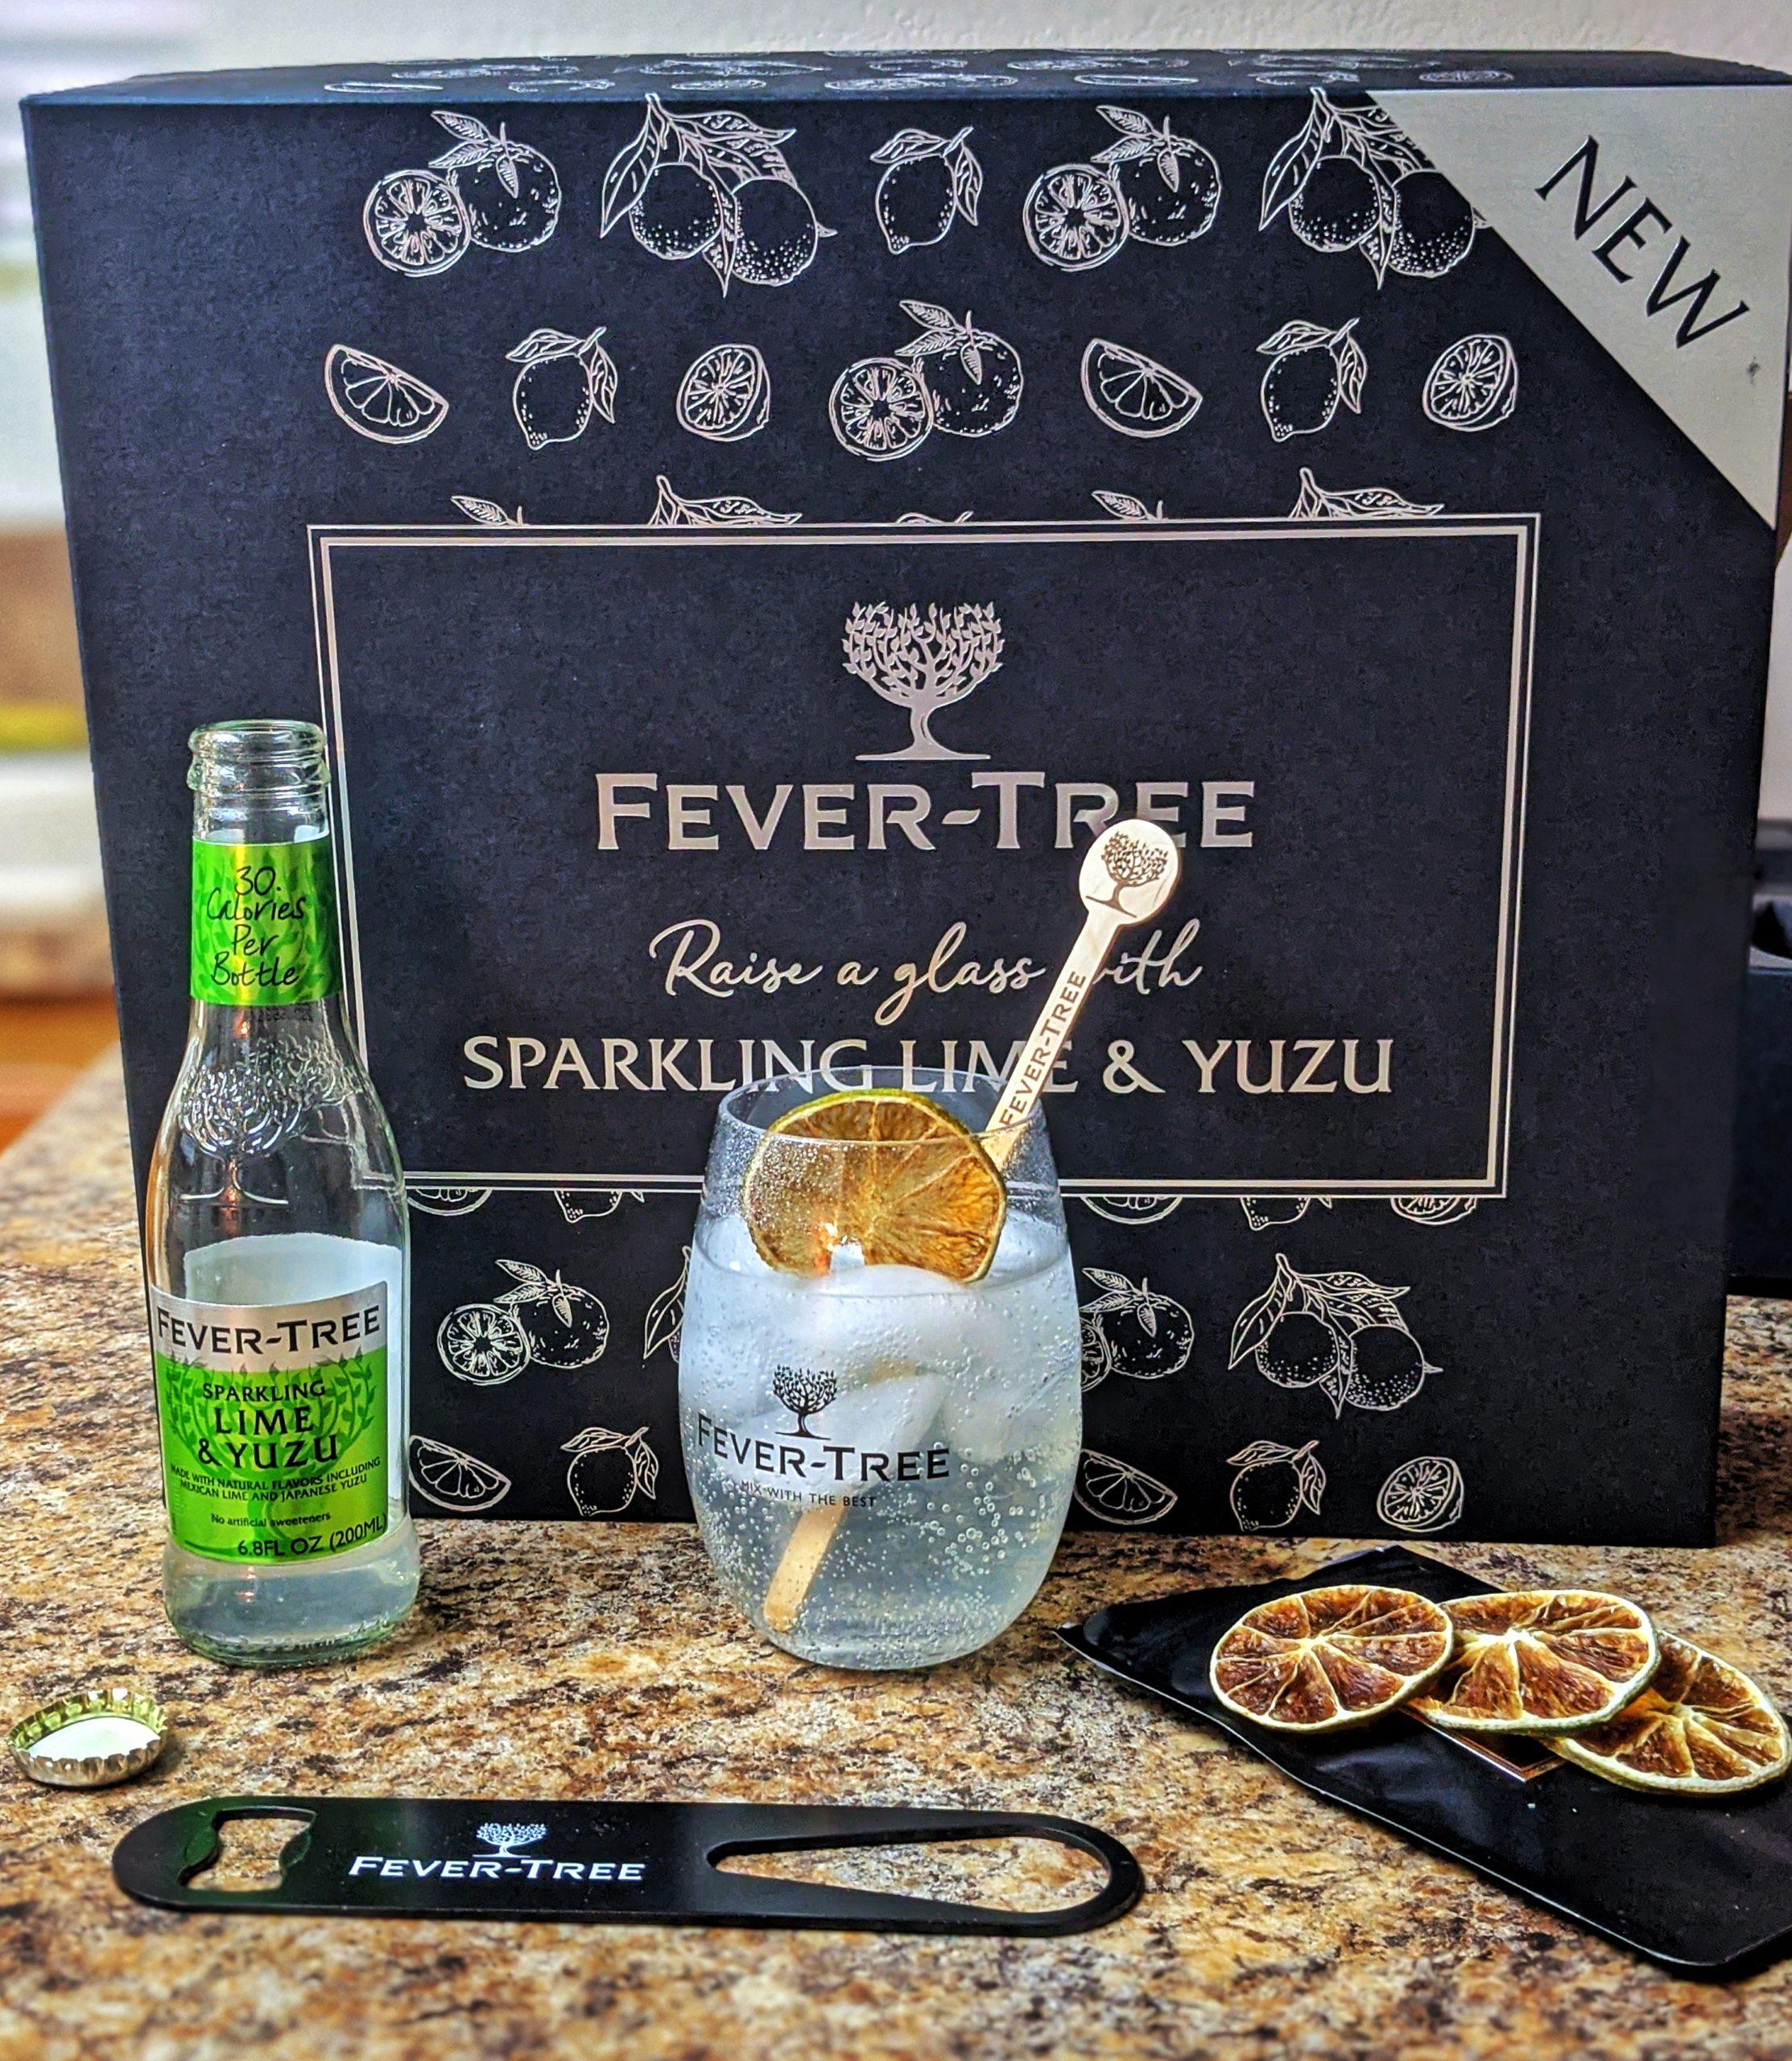 new Fever Tree flavor sparkling lime yuzu